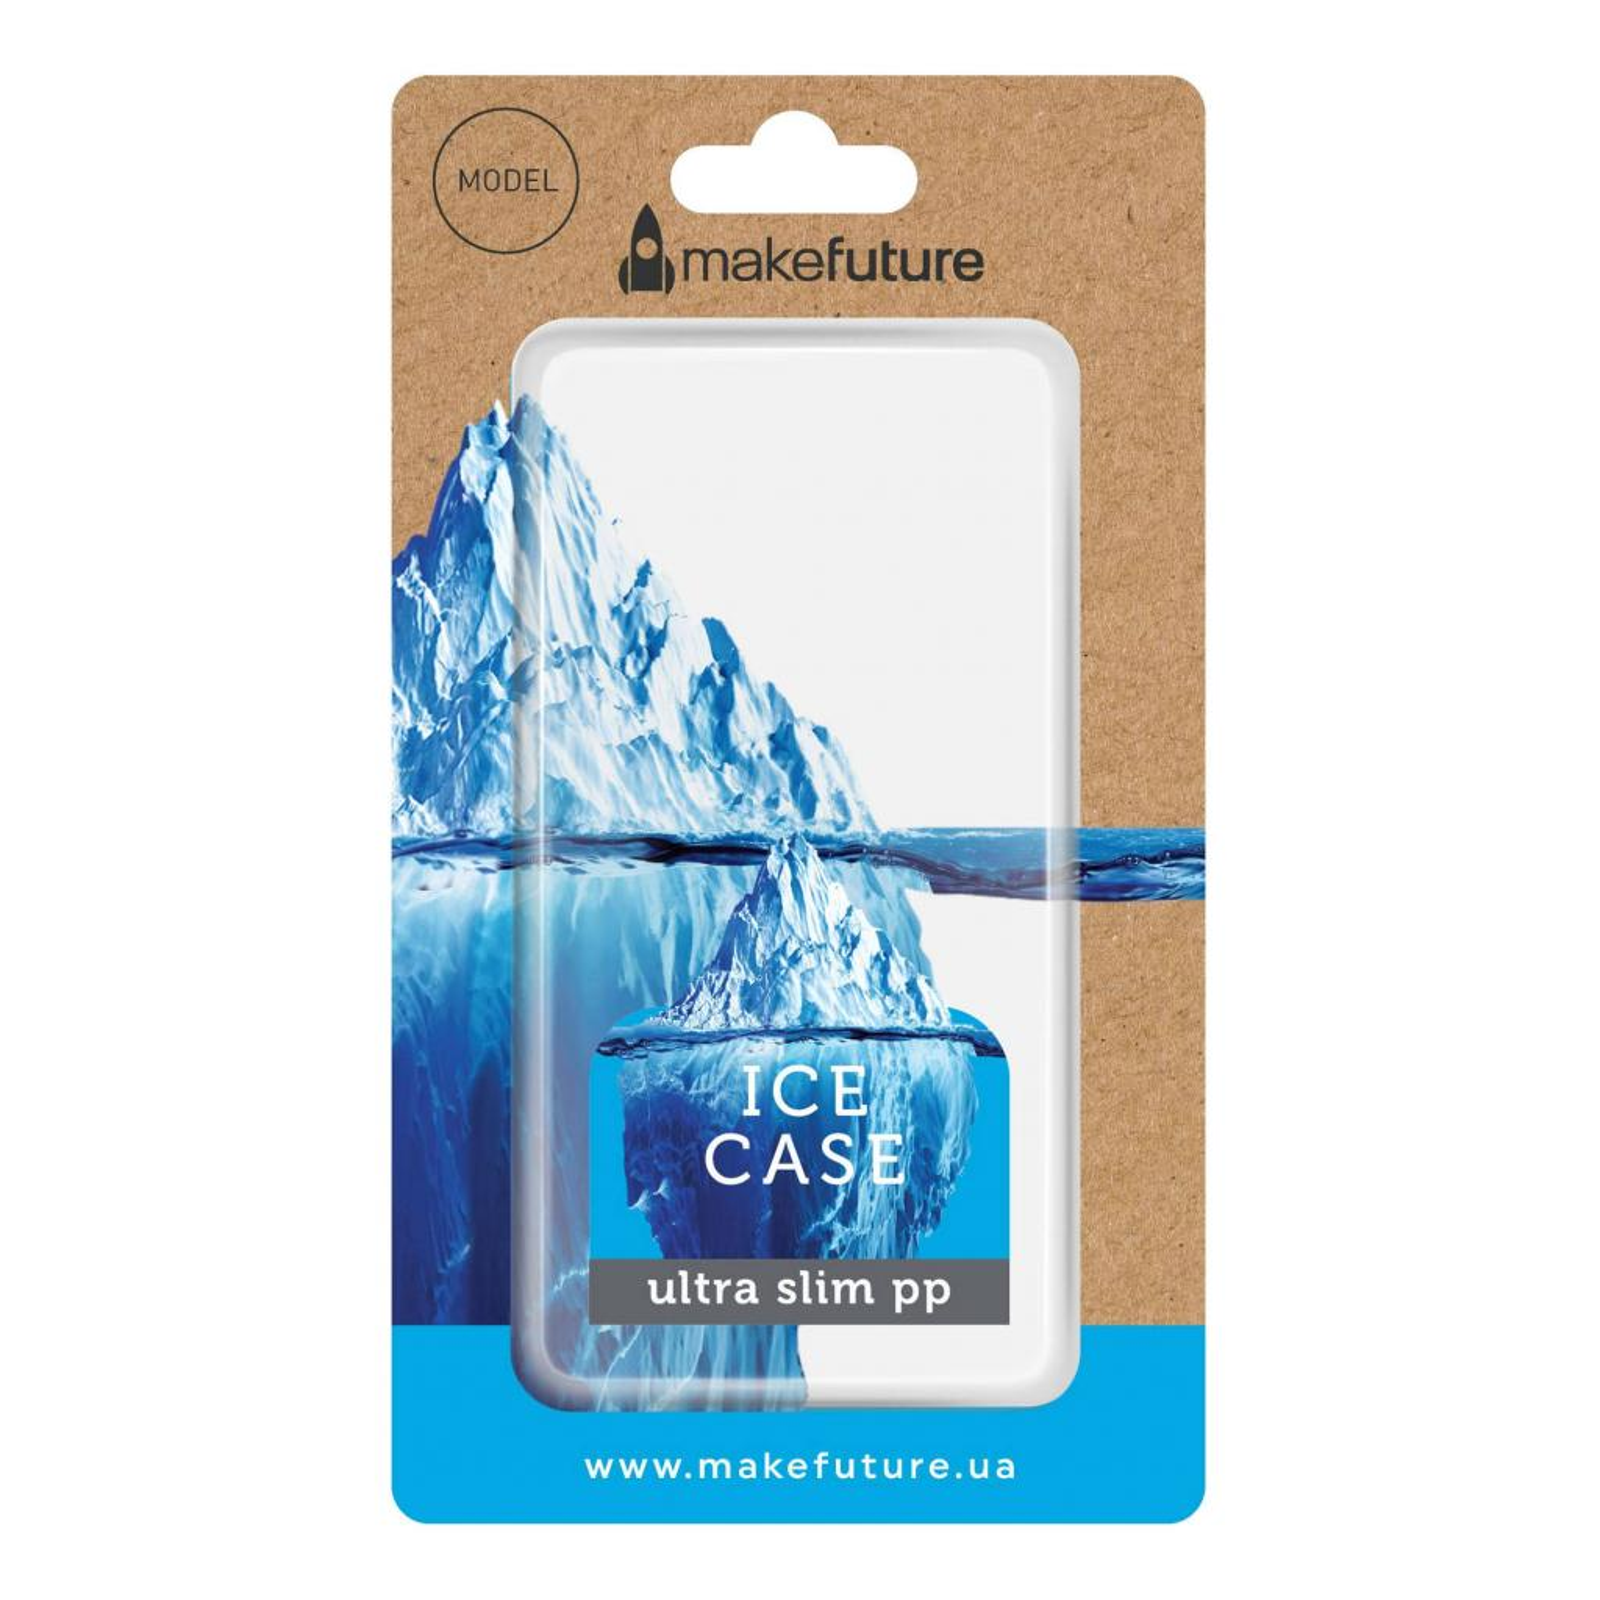 Чехол для моб. телефона MakeFuture Ice Case (PP) для Apple iPhone 6 Blue (MCI-AI6BL) изображение 7